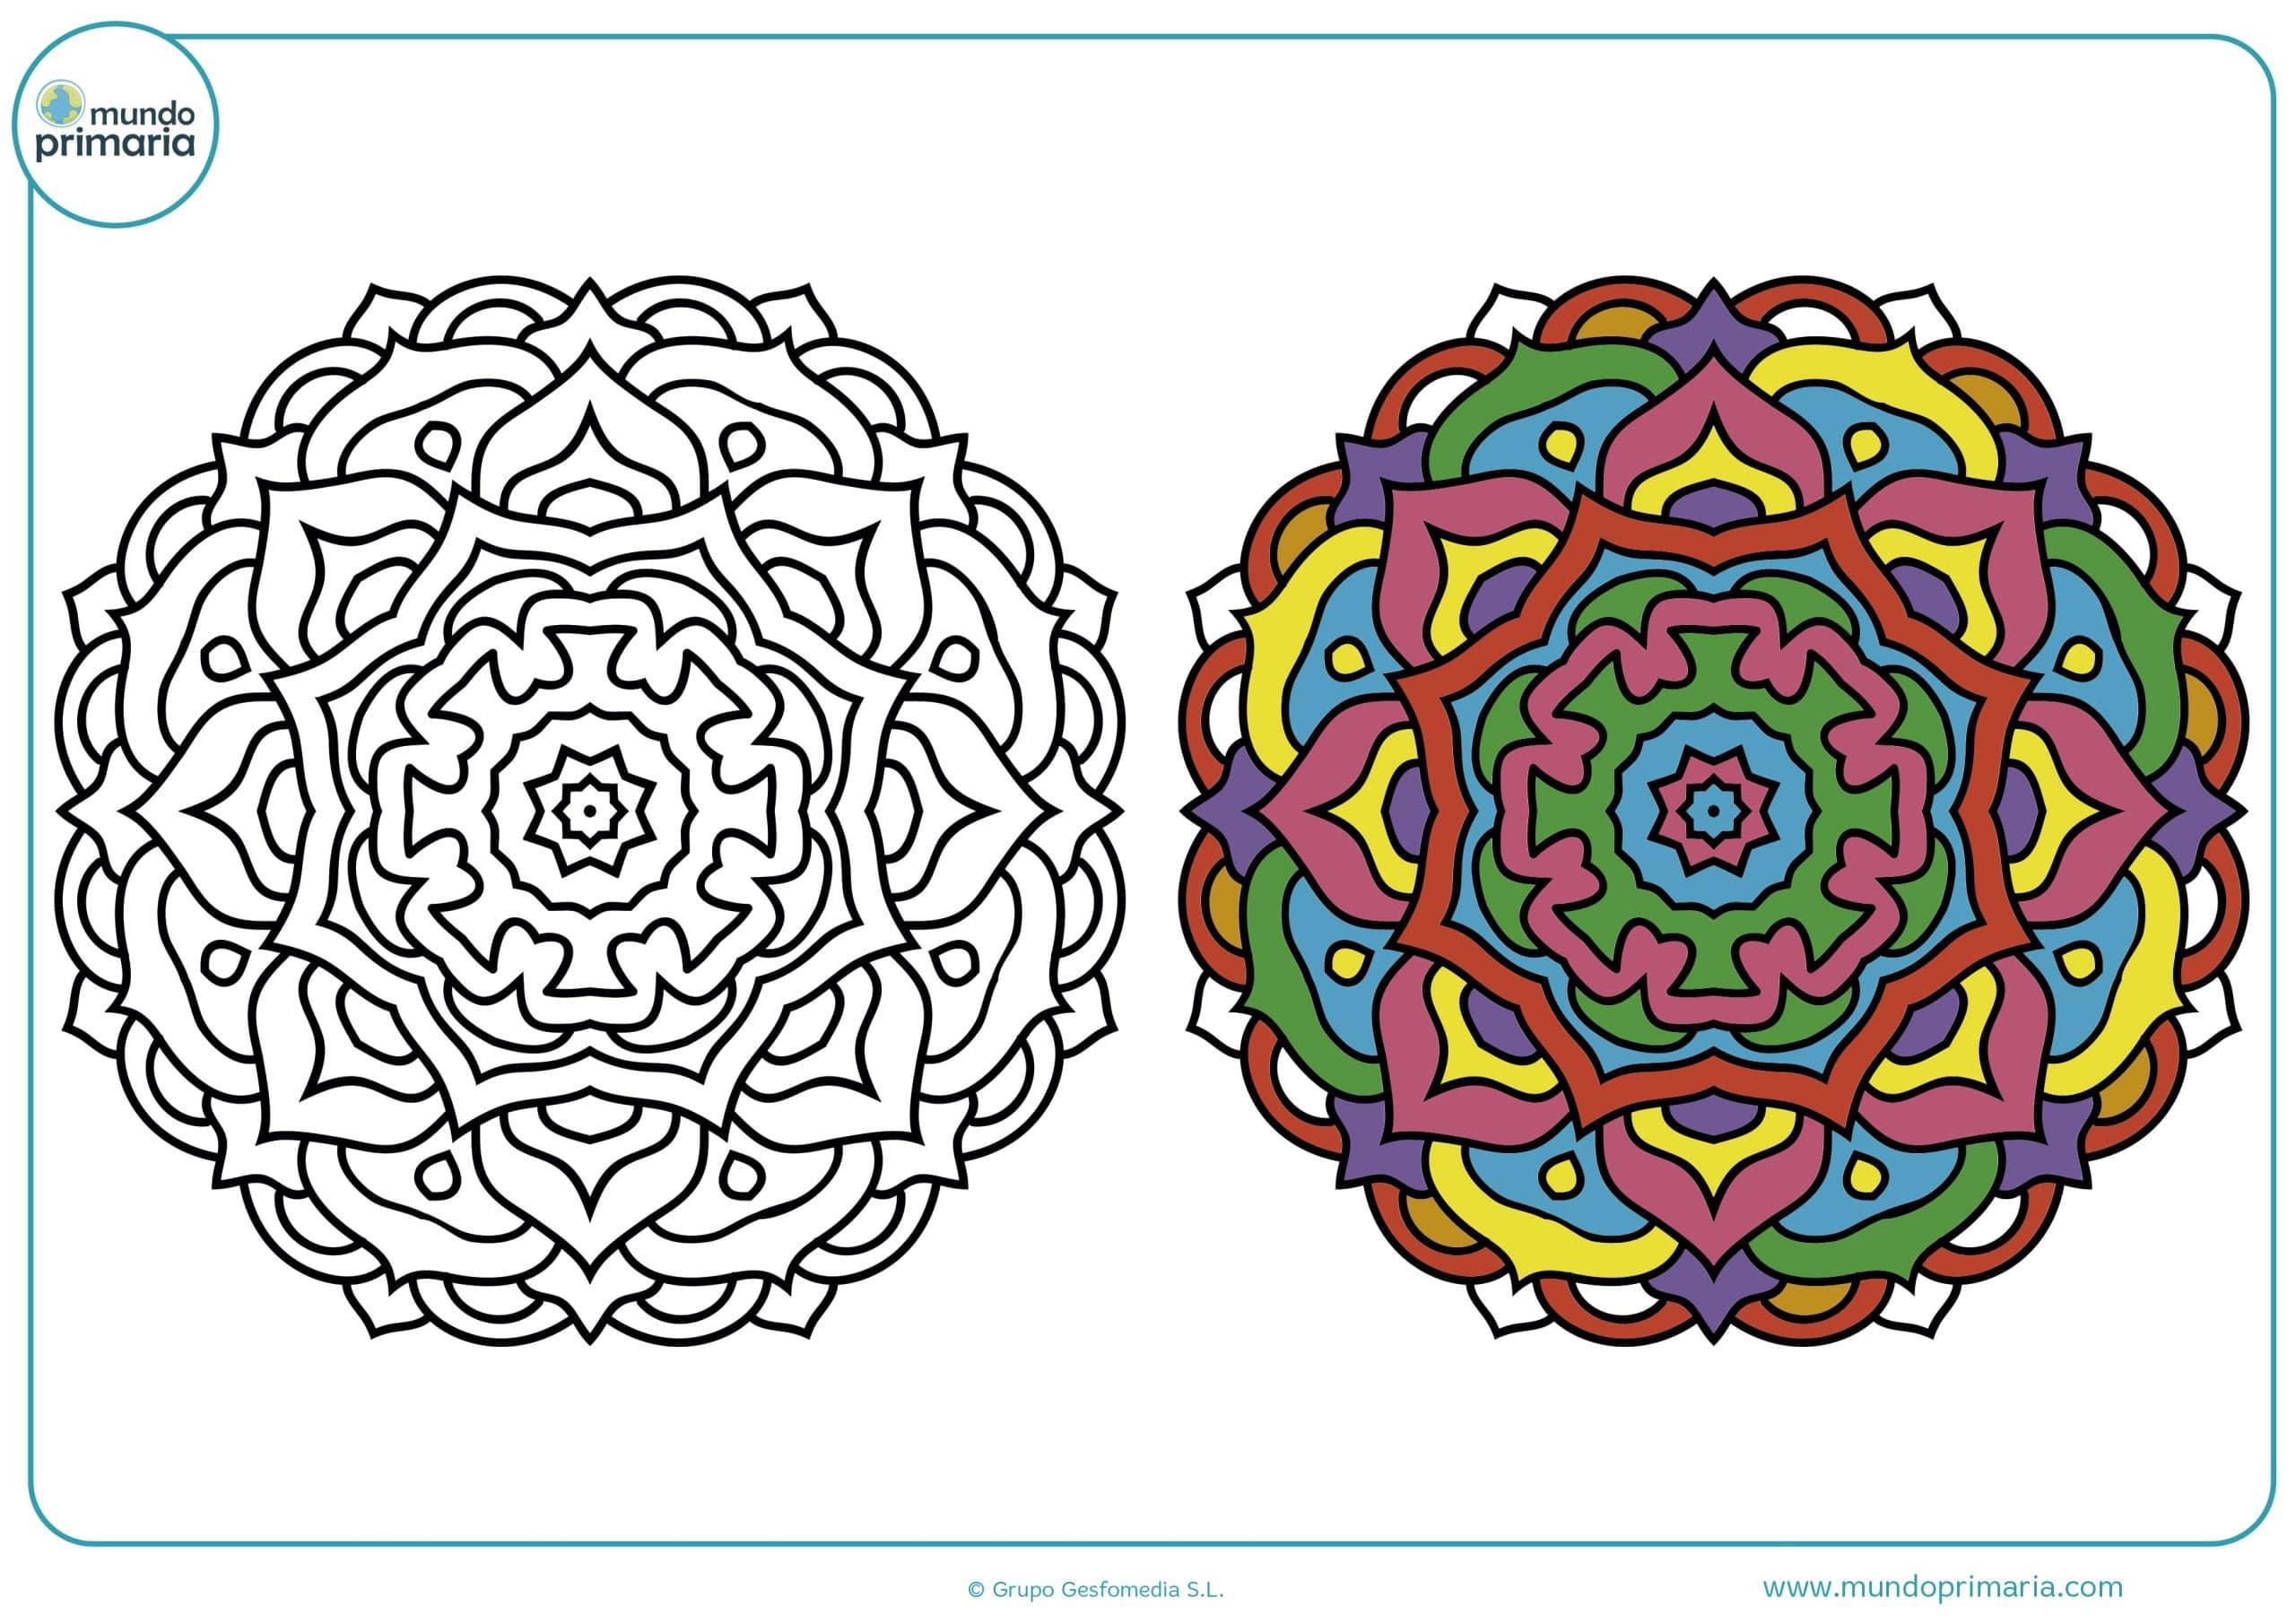 Como Colorear Mandalas. Stunning Gallery Of Free Colorear Mandalas ...